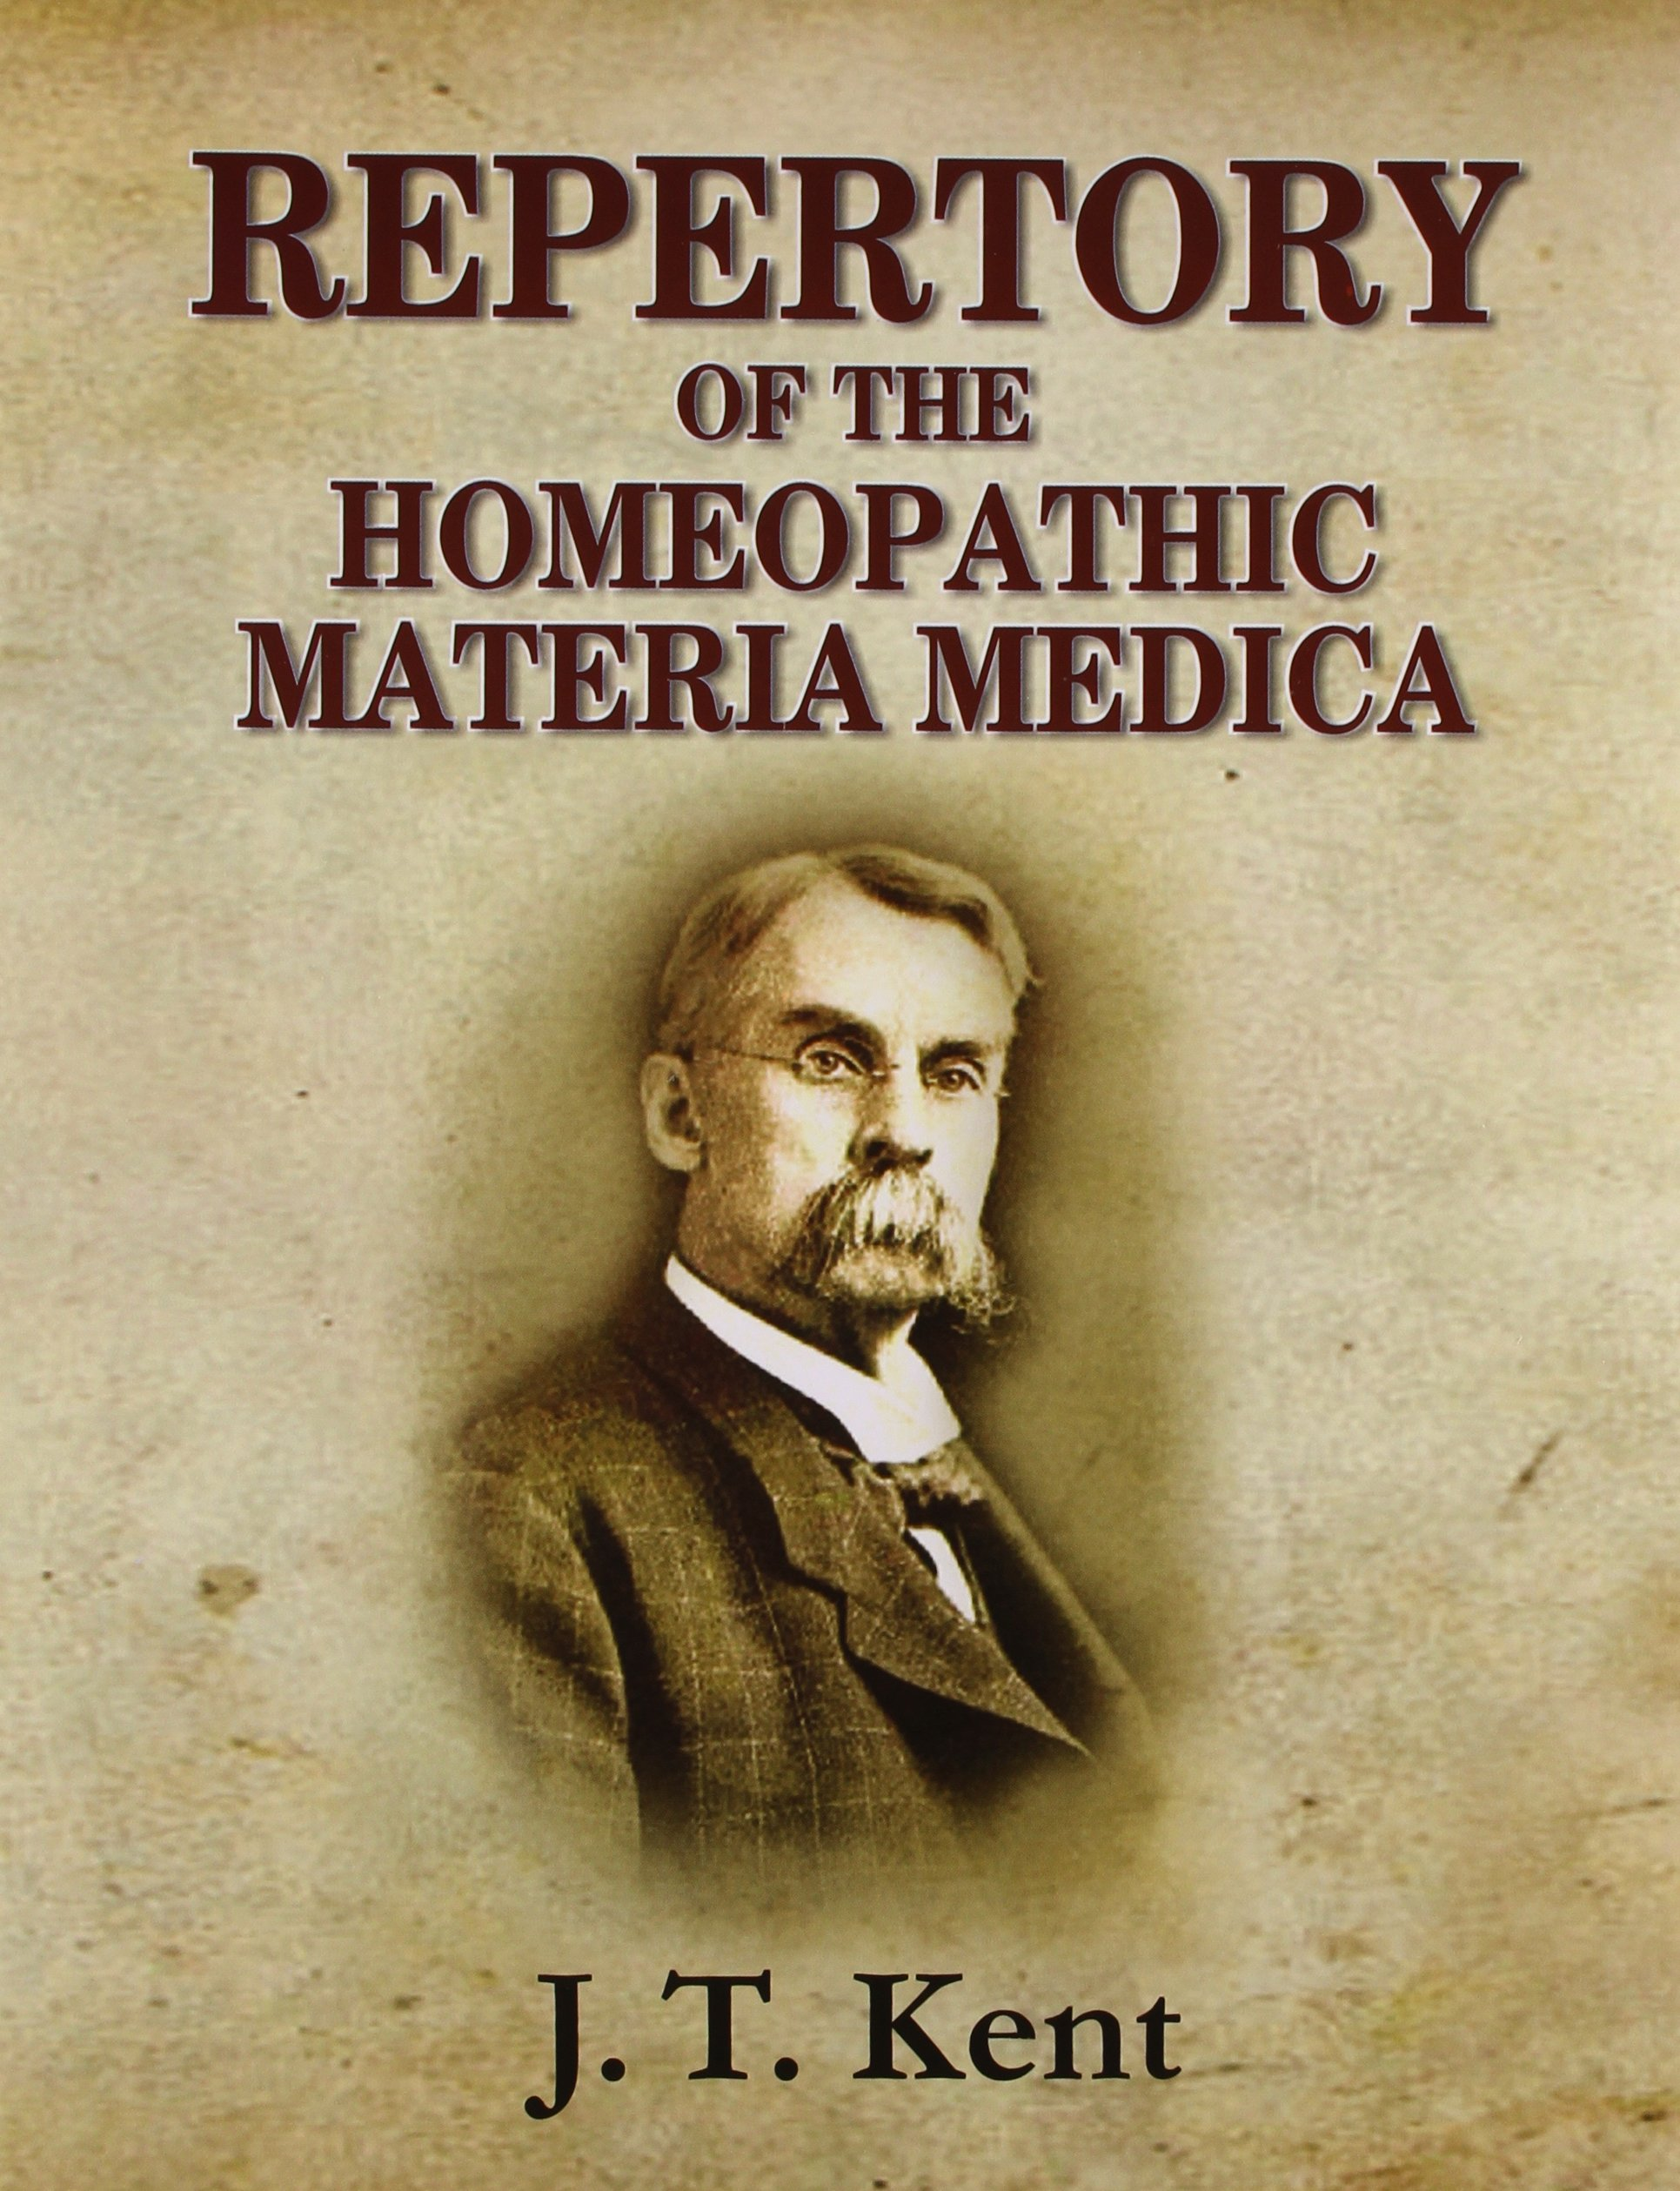 kent homeopathic repertory